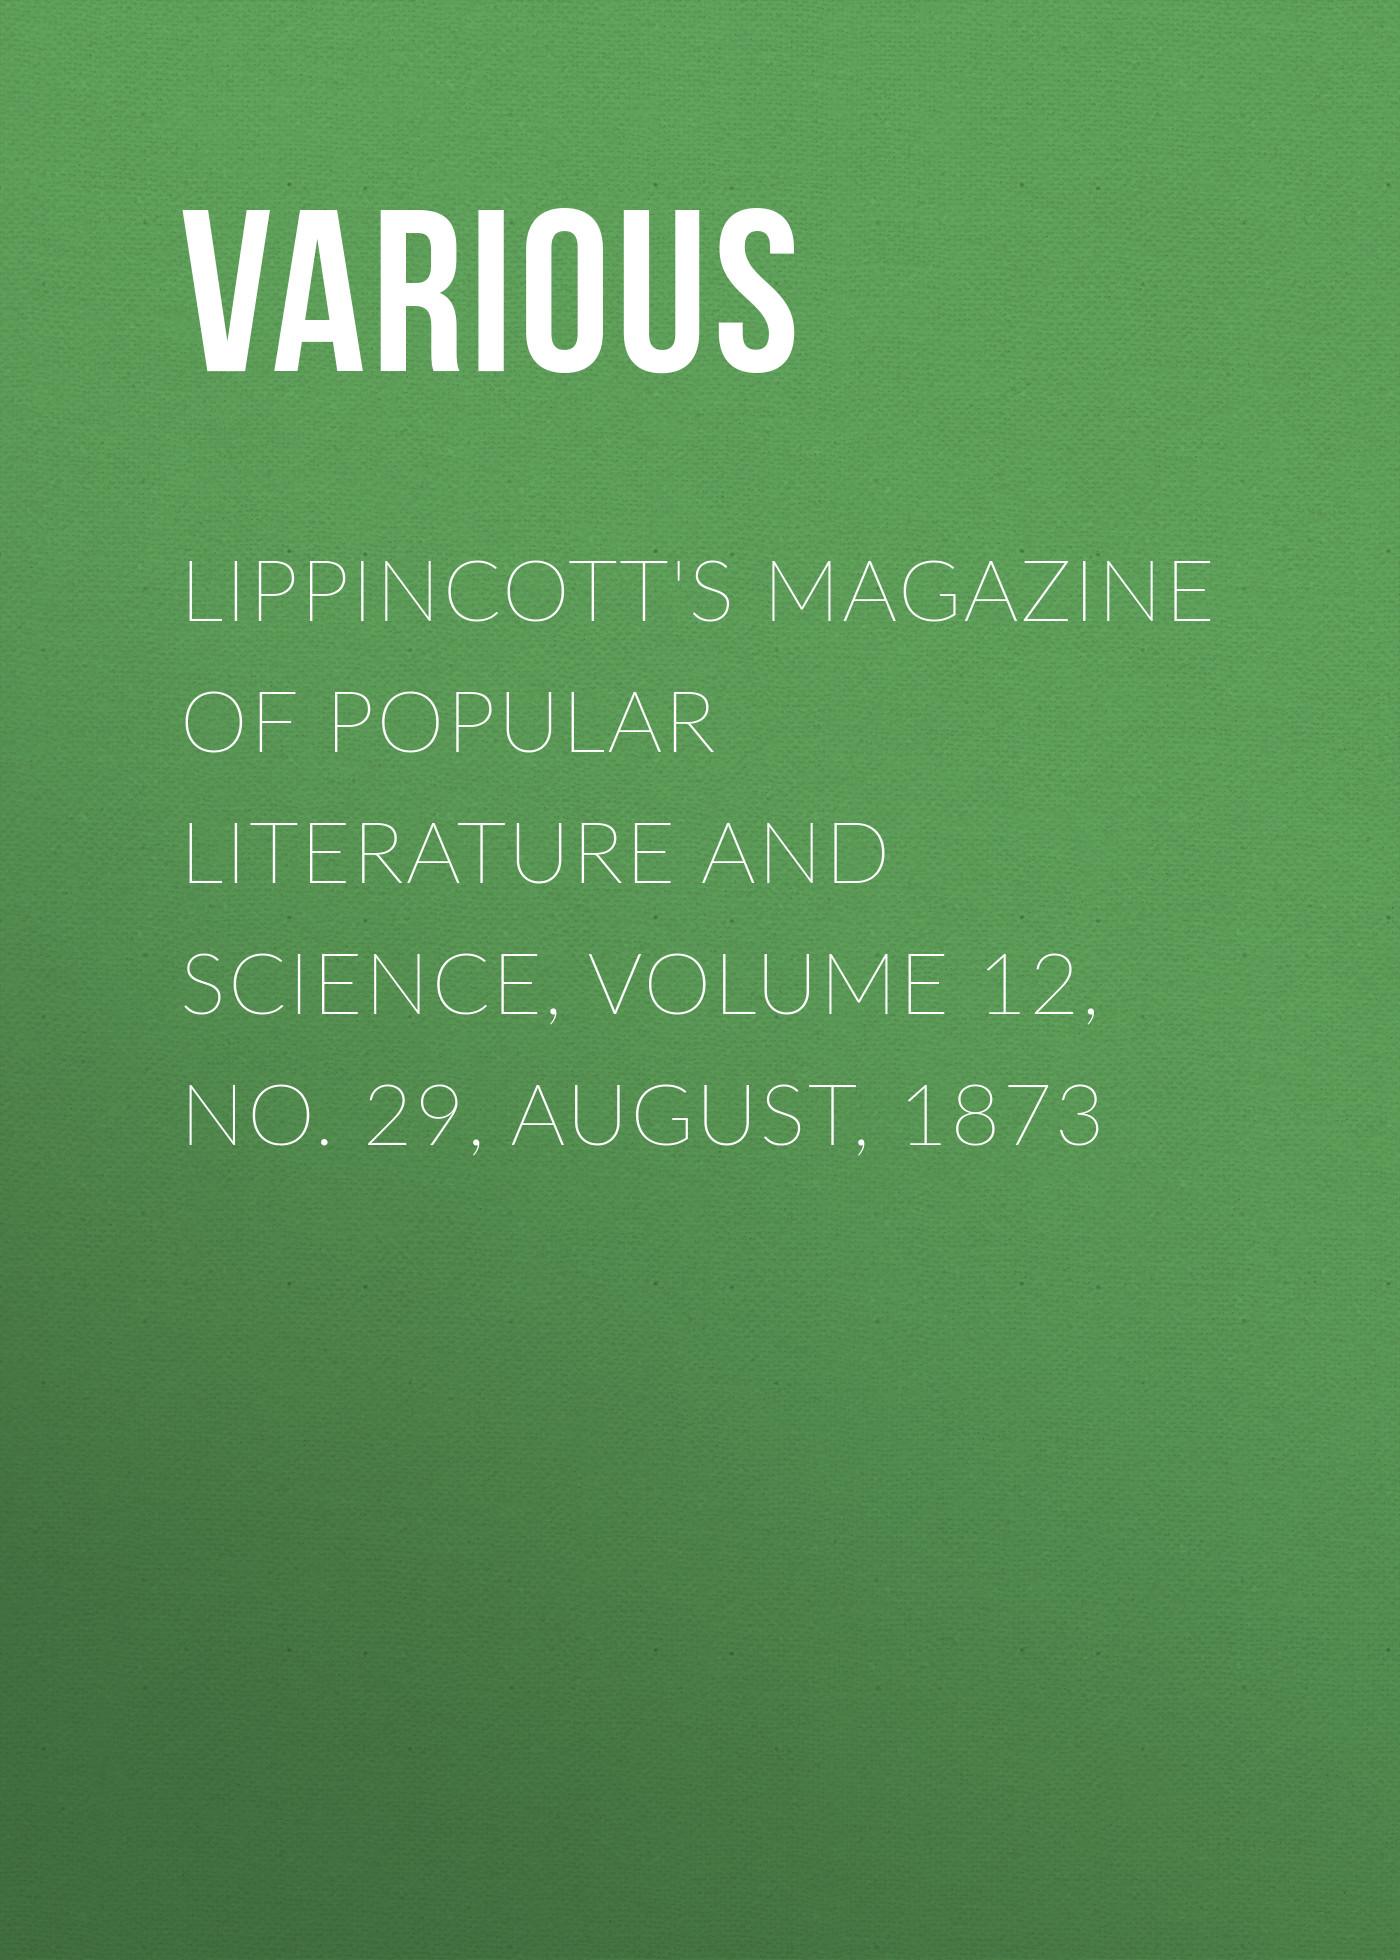 Various Lippincott's Magazine of Popular Literature and Science, Volume 12, No. 29, August, 1873 dai wang 1837 1873 guanzi jiao zheng 24 juan volume 4 mandarin chinese edition